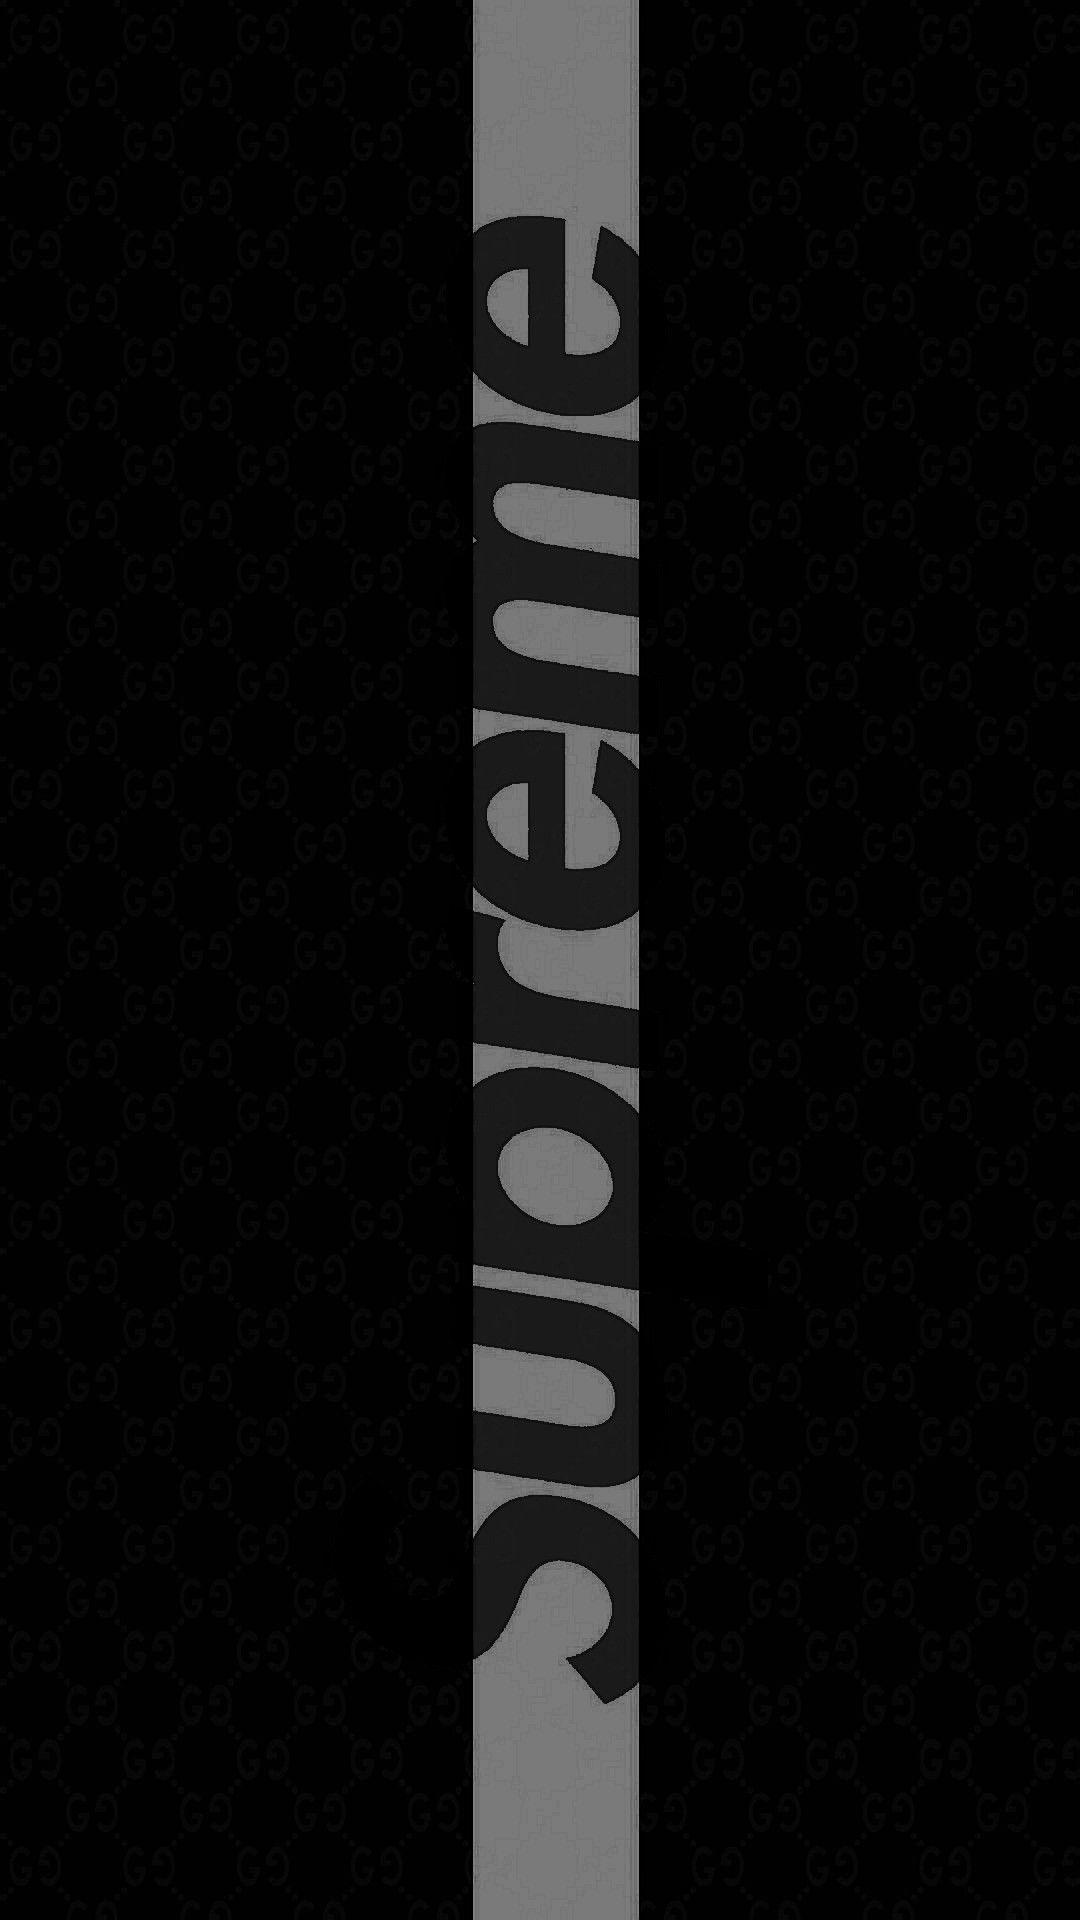 supreme iphone wallpaper 壁紙 ipad, スマホ壁紙, 壁紙